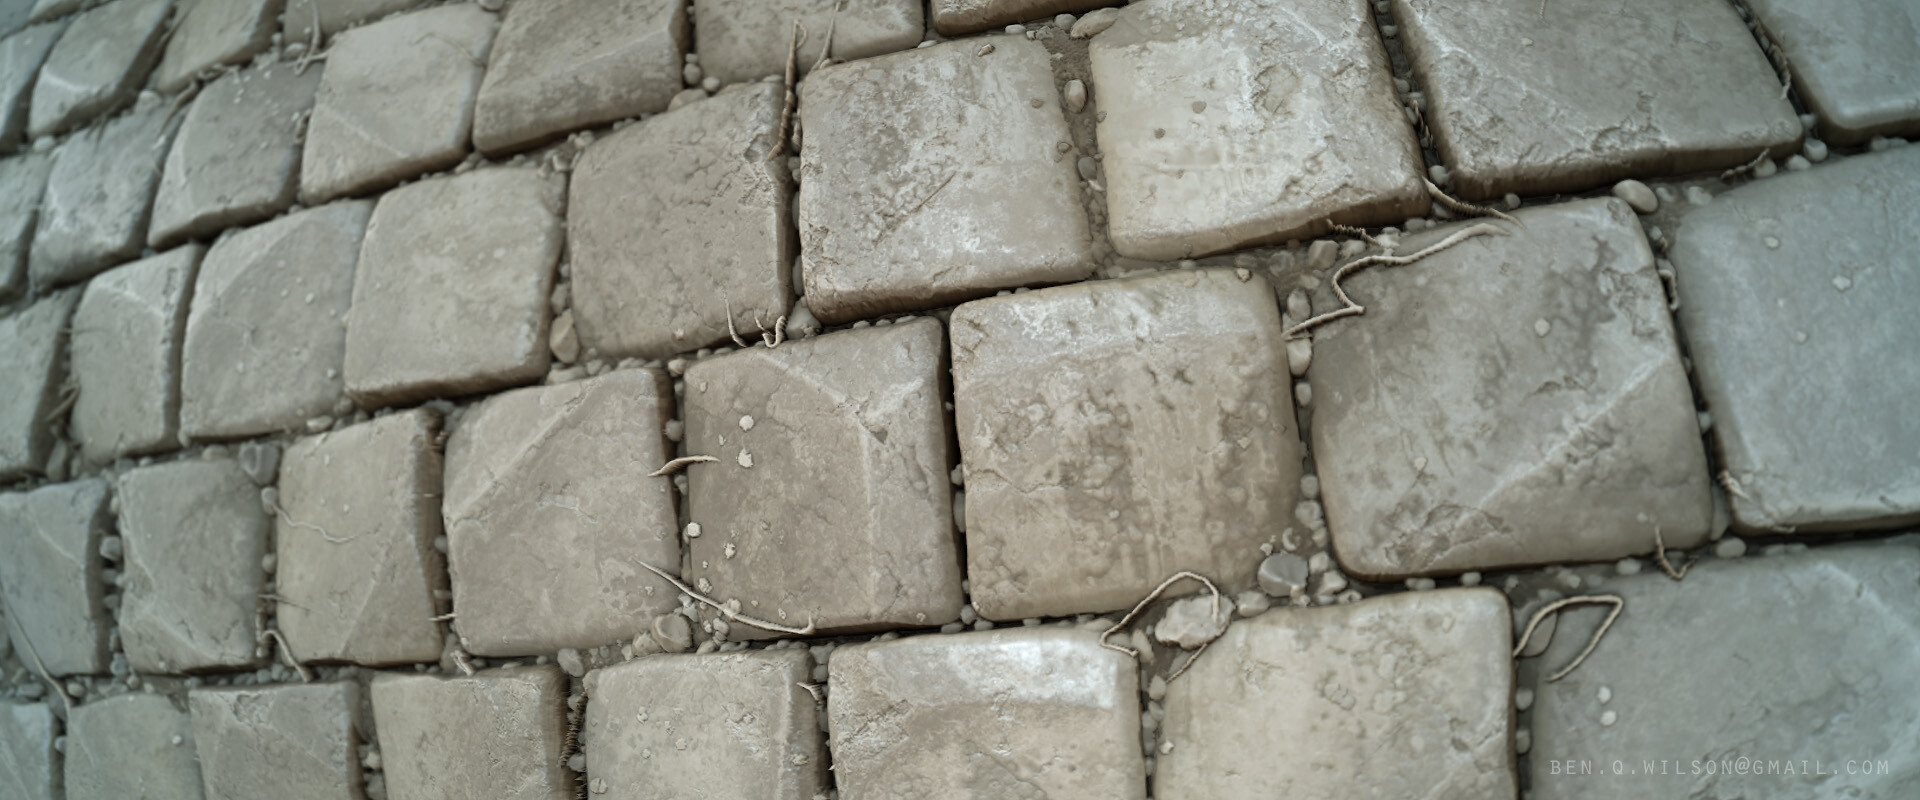 Ben wilson cobblestone a 02 1